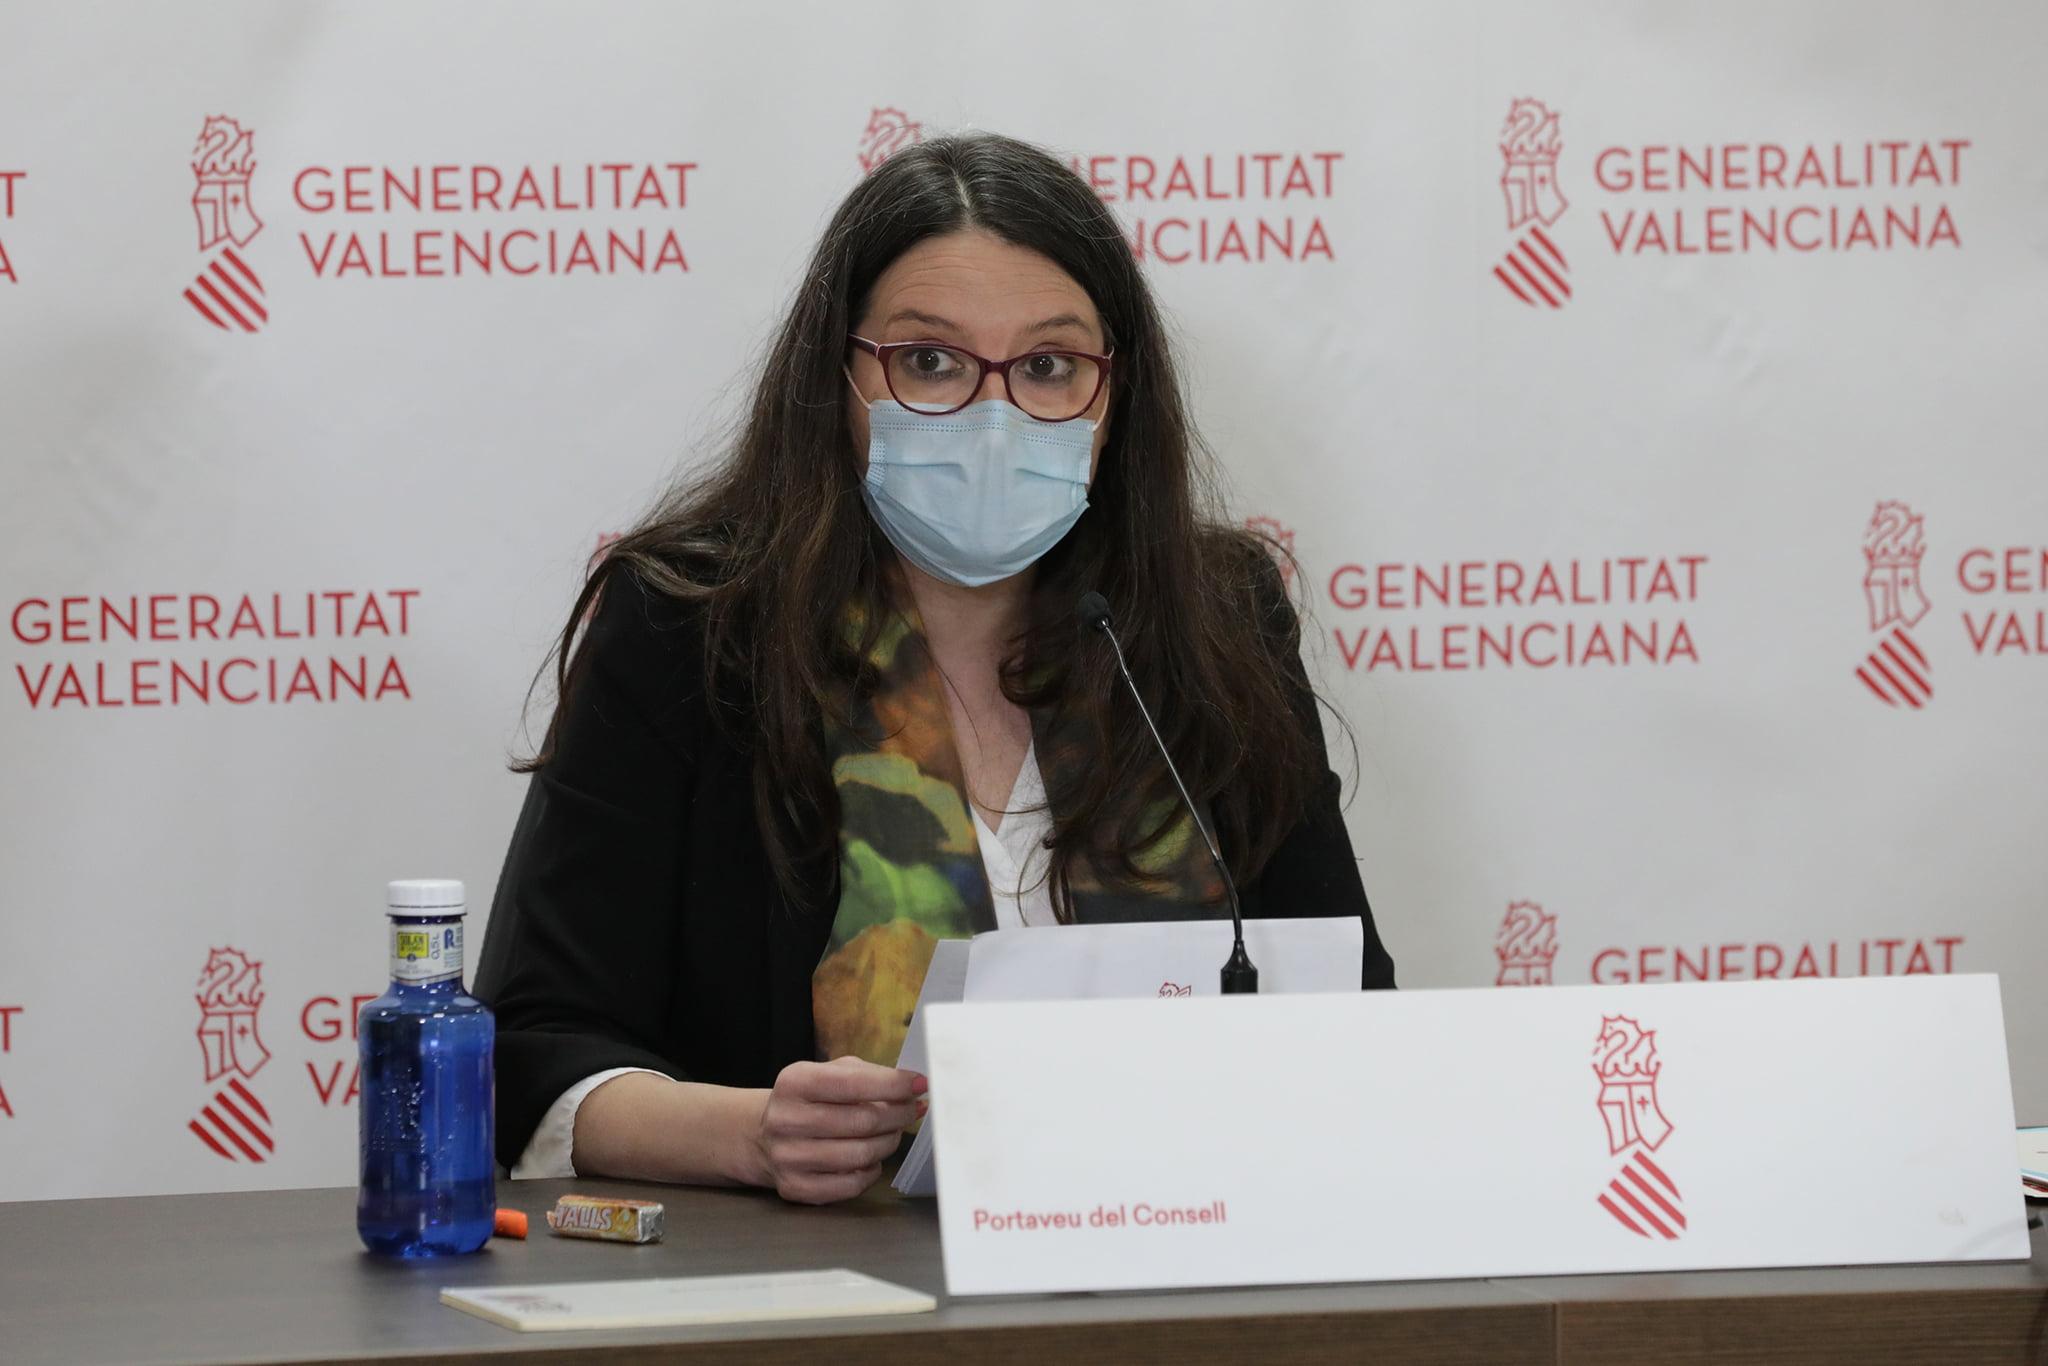 Mónica Oltra, vice-présidente de la Generalitat Valenciana